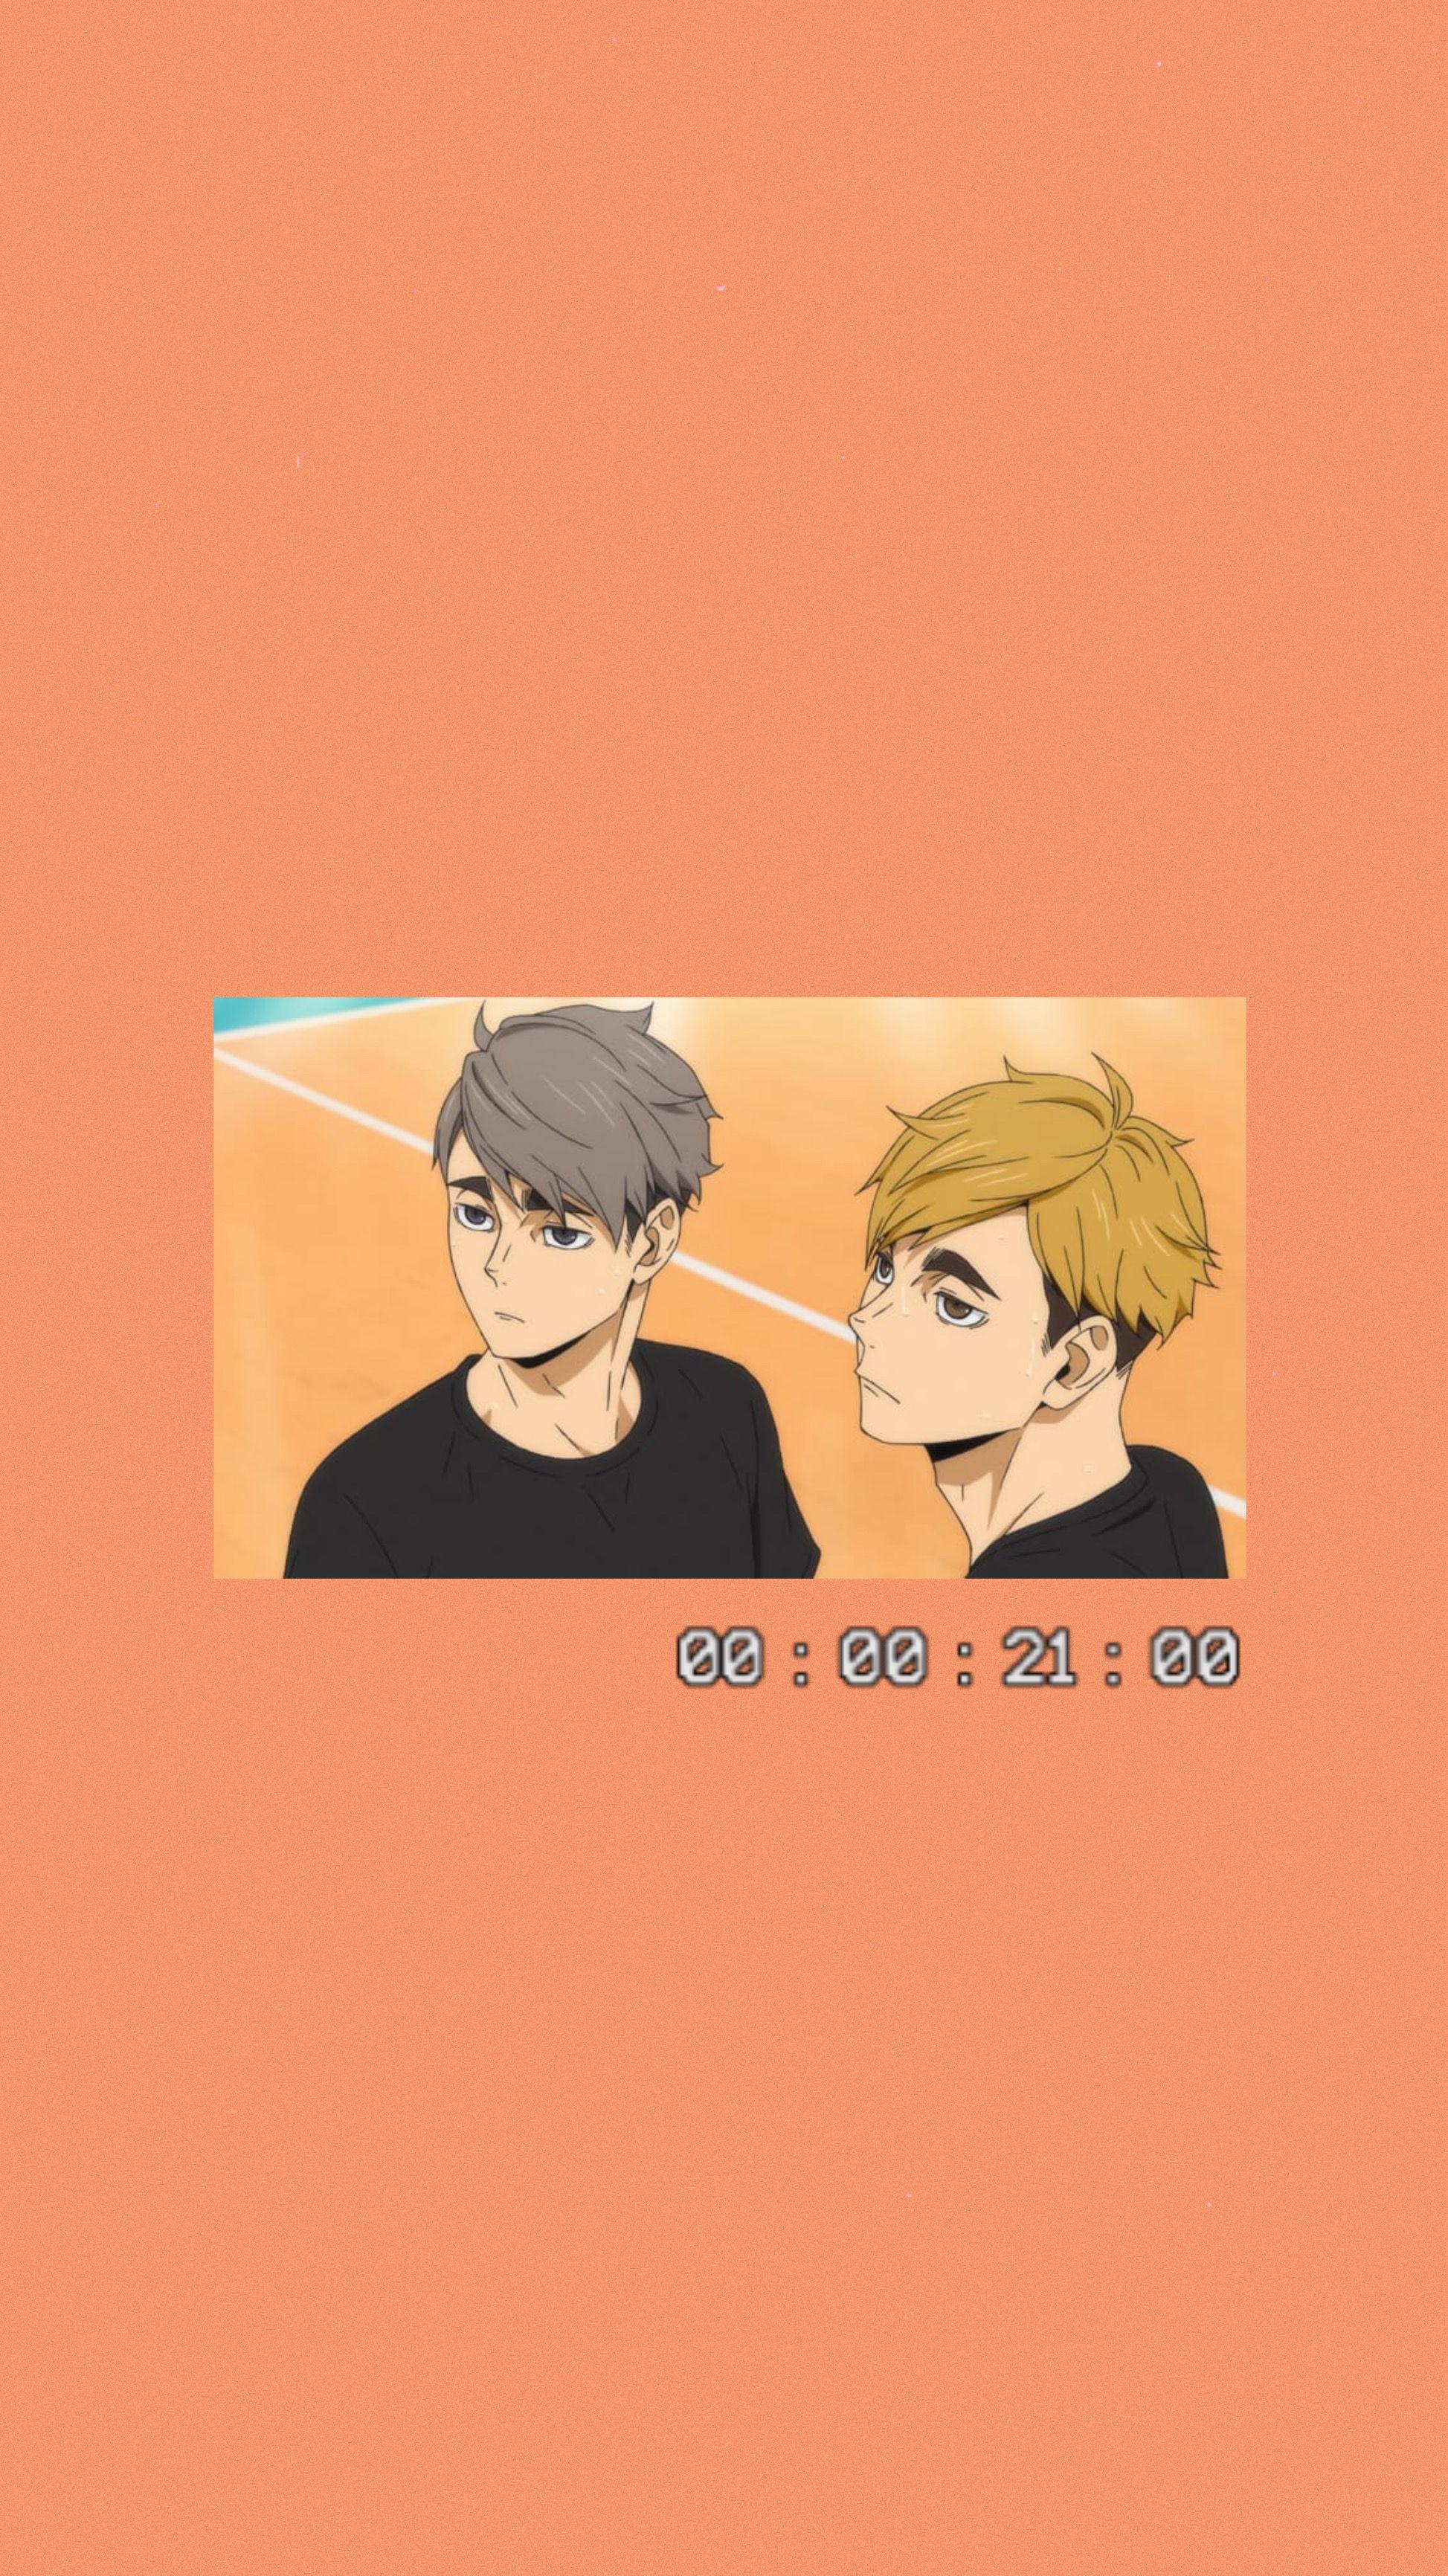 Atsumu Osamu Miya Haikyuu Wallpaper Haikyuu Anime Anime Wallpaper